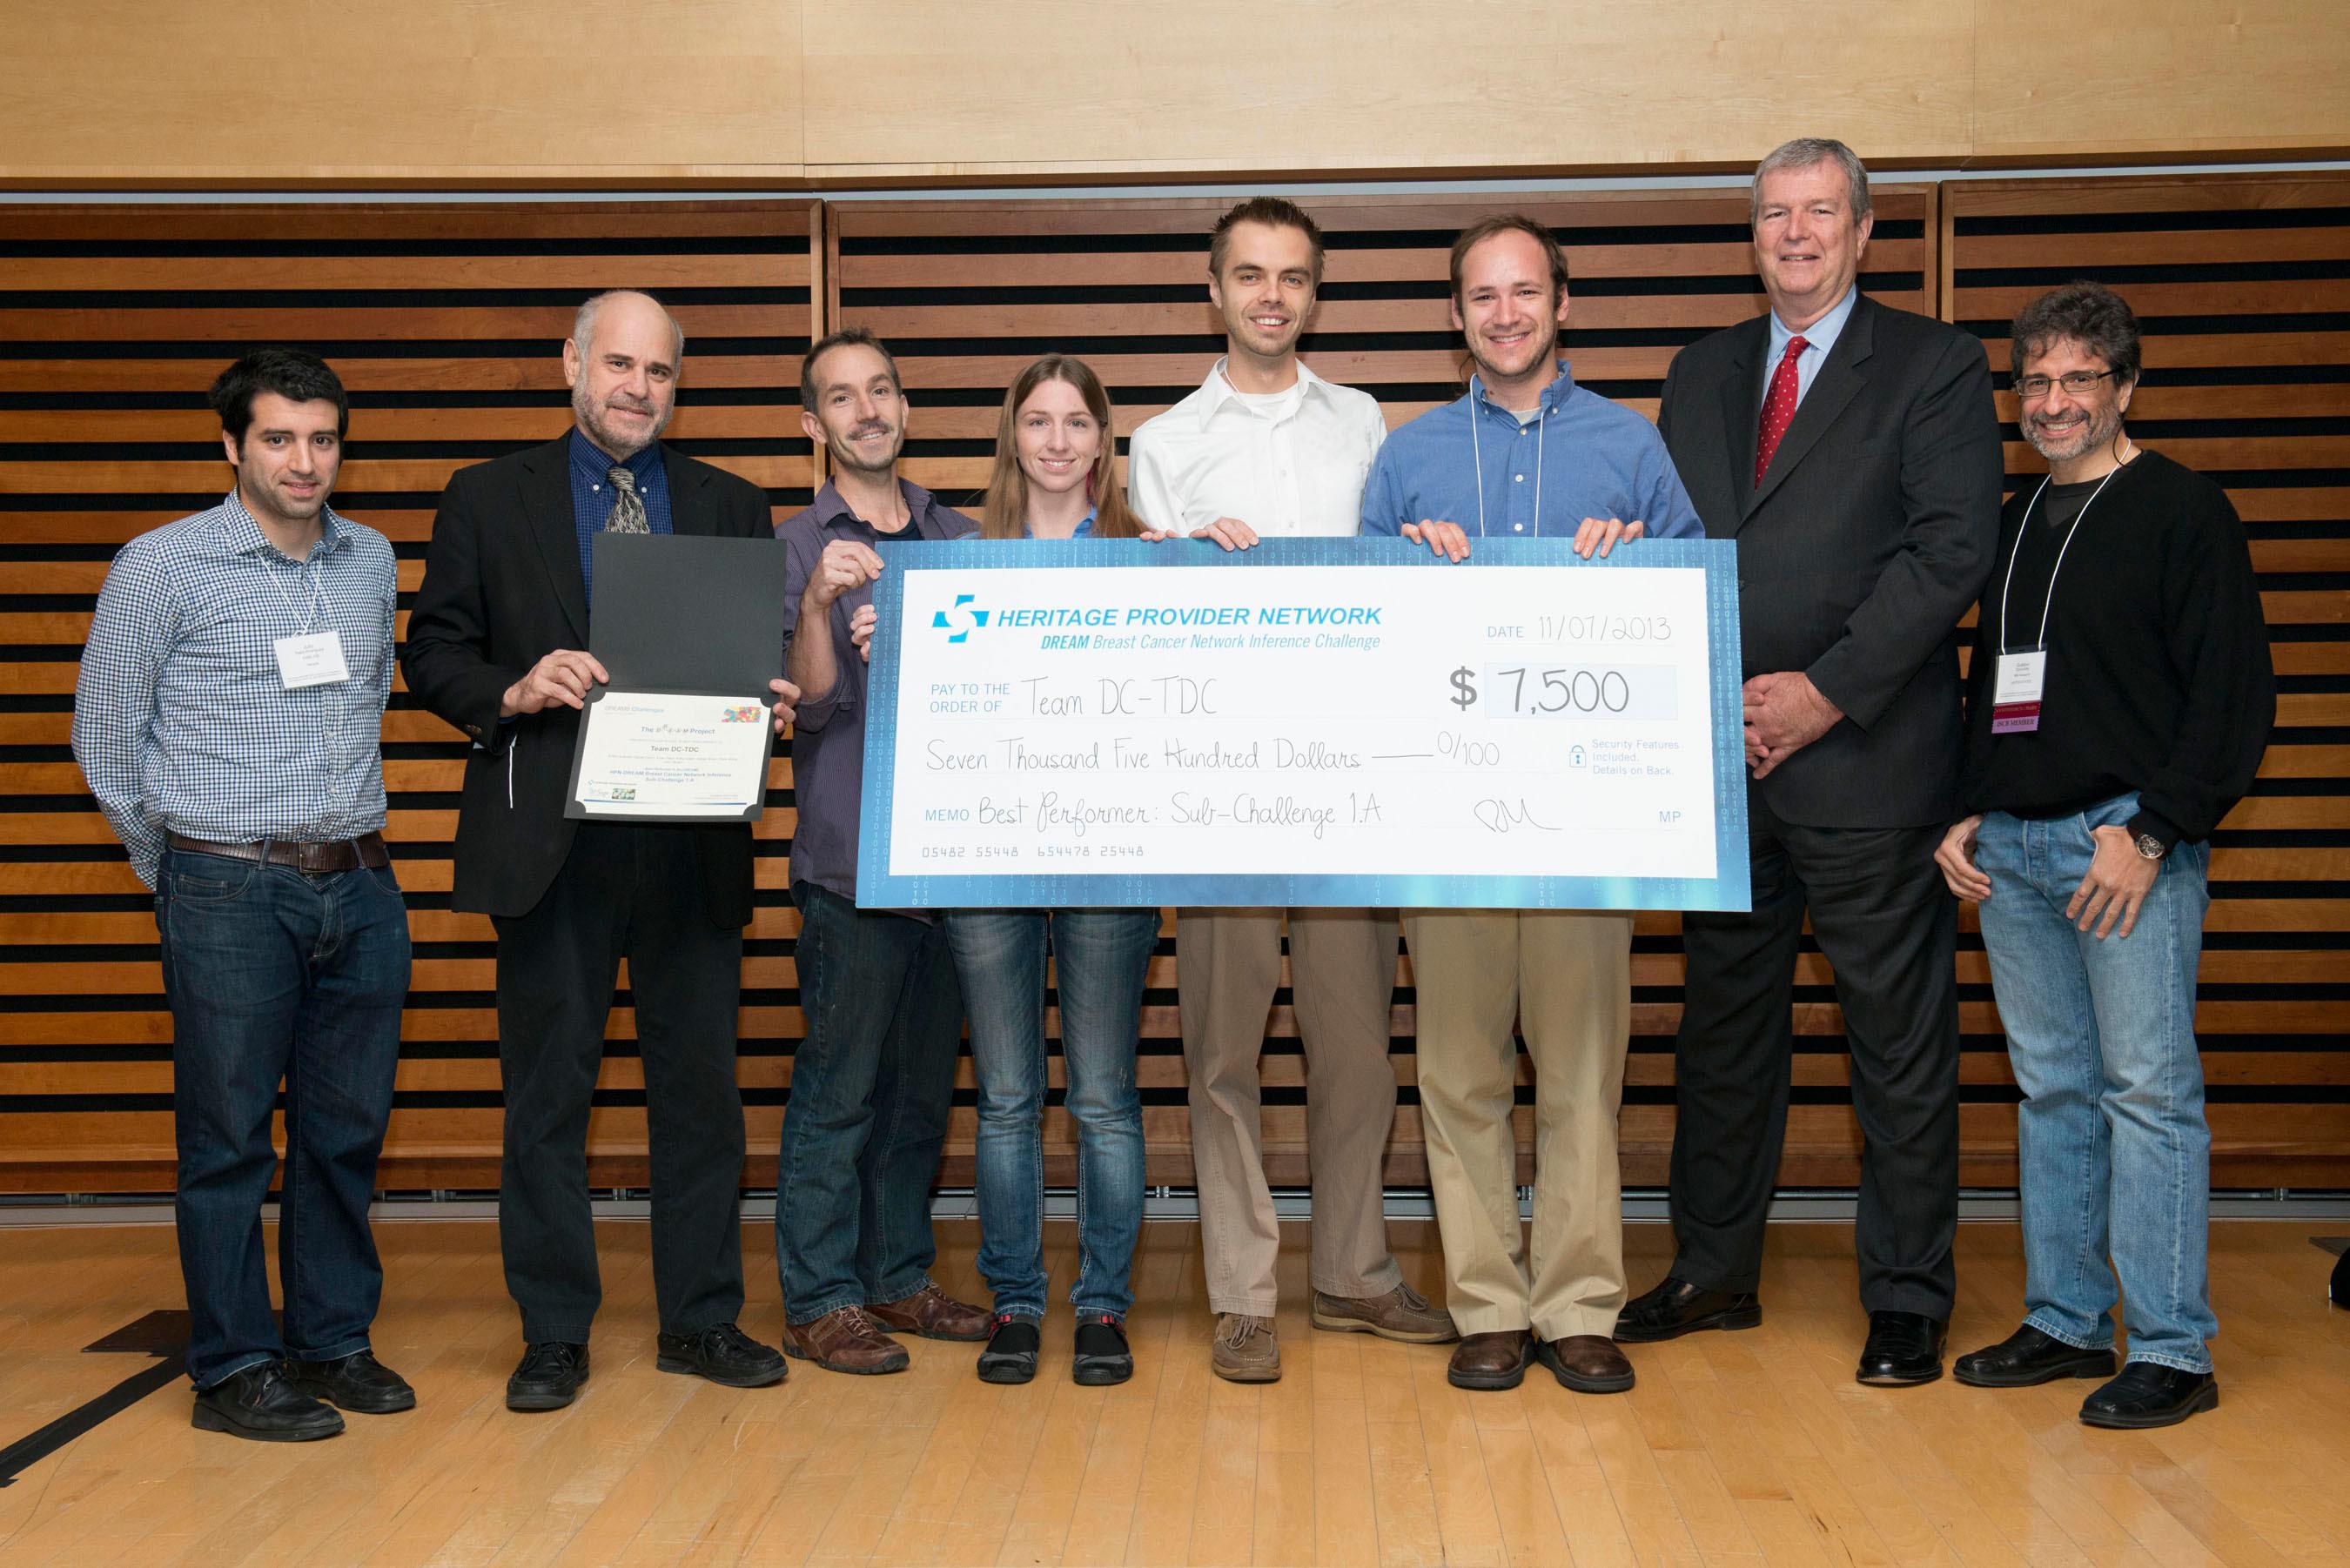 Team DC-TDC receives award in HPN-Dream Prize, Julio Saez-Rodriguez, EMBL, UK, Dan Gallagan, NCI, Josh Stuart, Kiley Graim, Artem Sokolov, Team Leader, Dan Carlin, Mark Wagar, President Heritage Medical Systems and Gustavo Stolovitzky, IBM and Dream Founder. (PRNewsFoto/Heritage Provider Network) (PRNewsFoto/HERITAGE PROVIDER NETWORK)